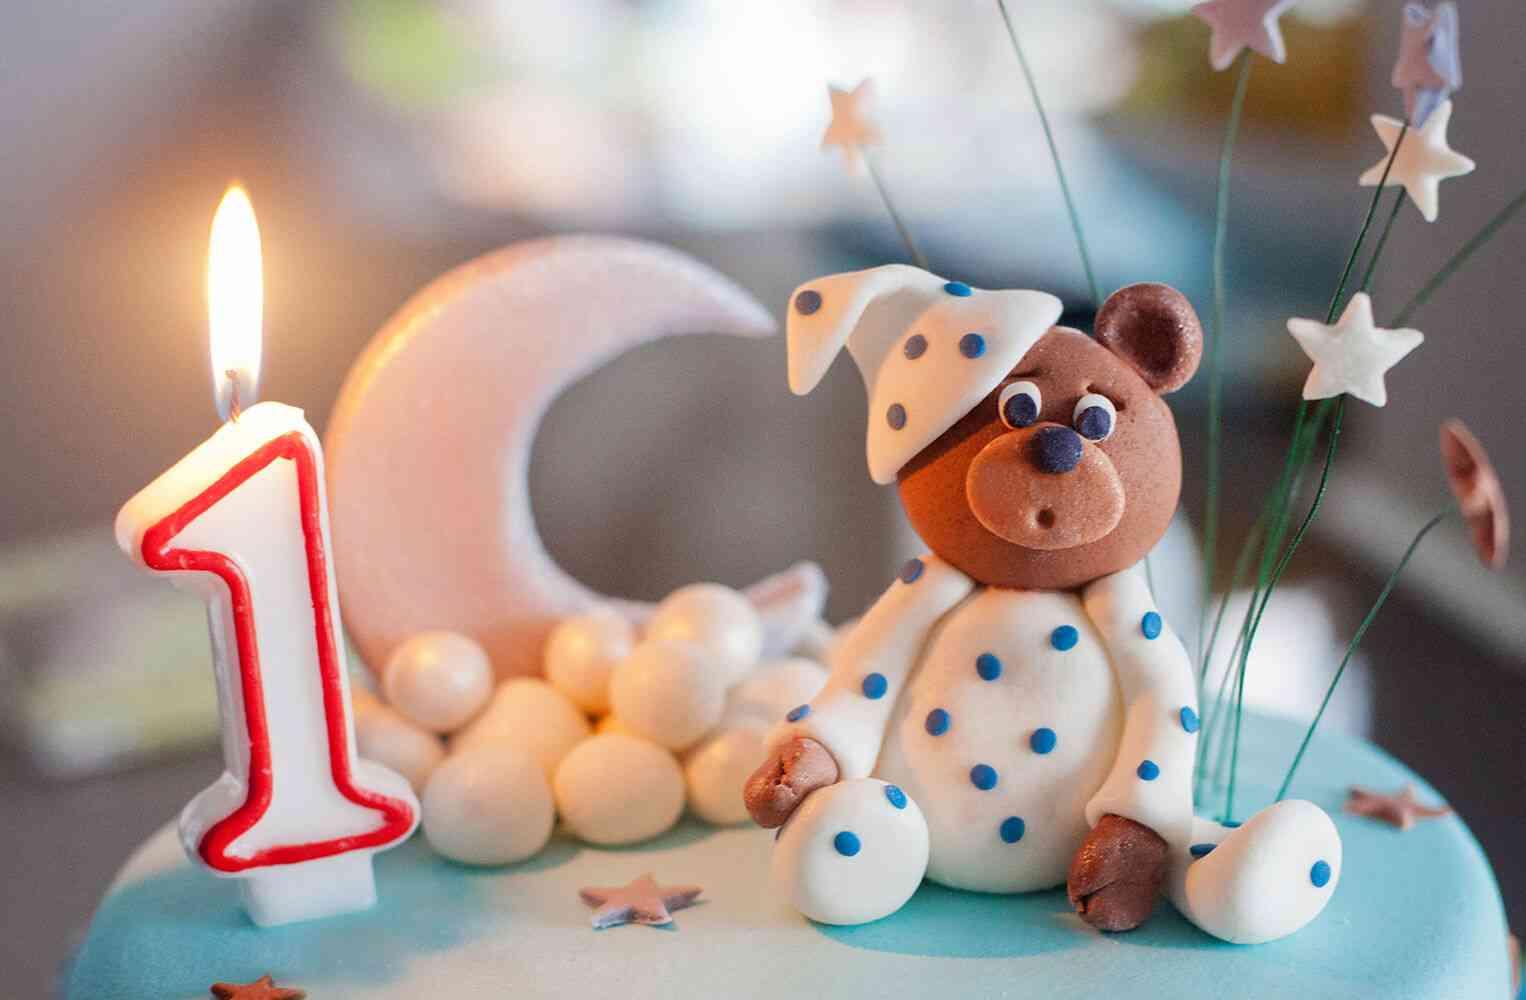 Картинки с днем рождения ребенка 1 год родителям